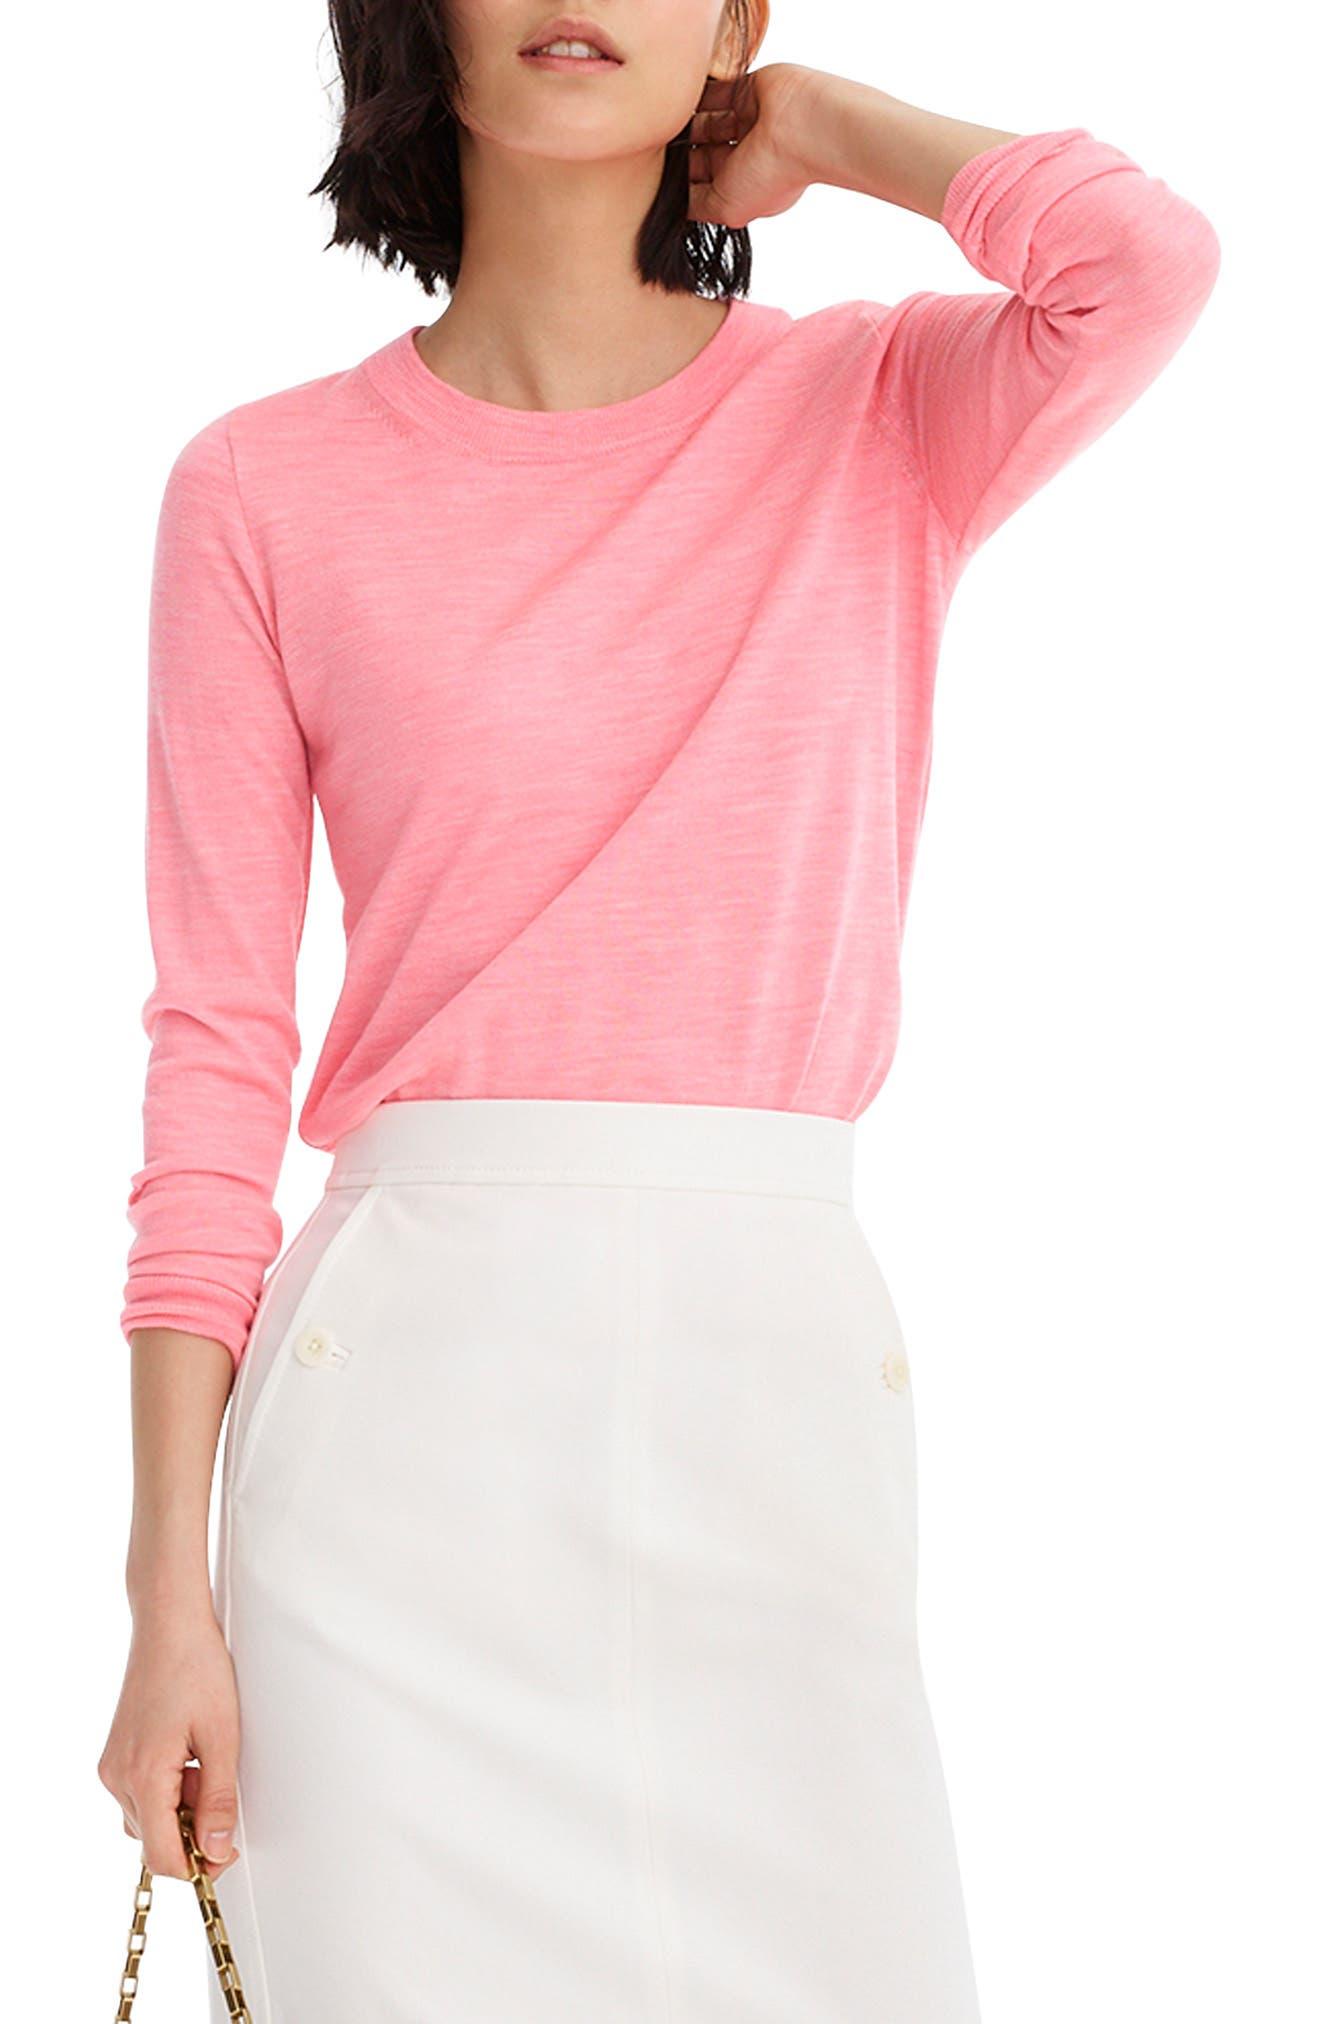 Plus Size J.crew Tippi Merino Wool Sweater, Grey